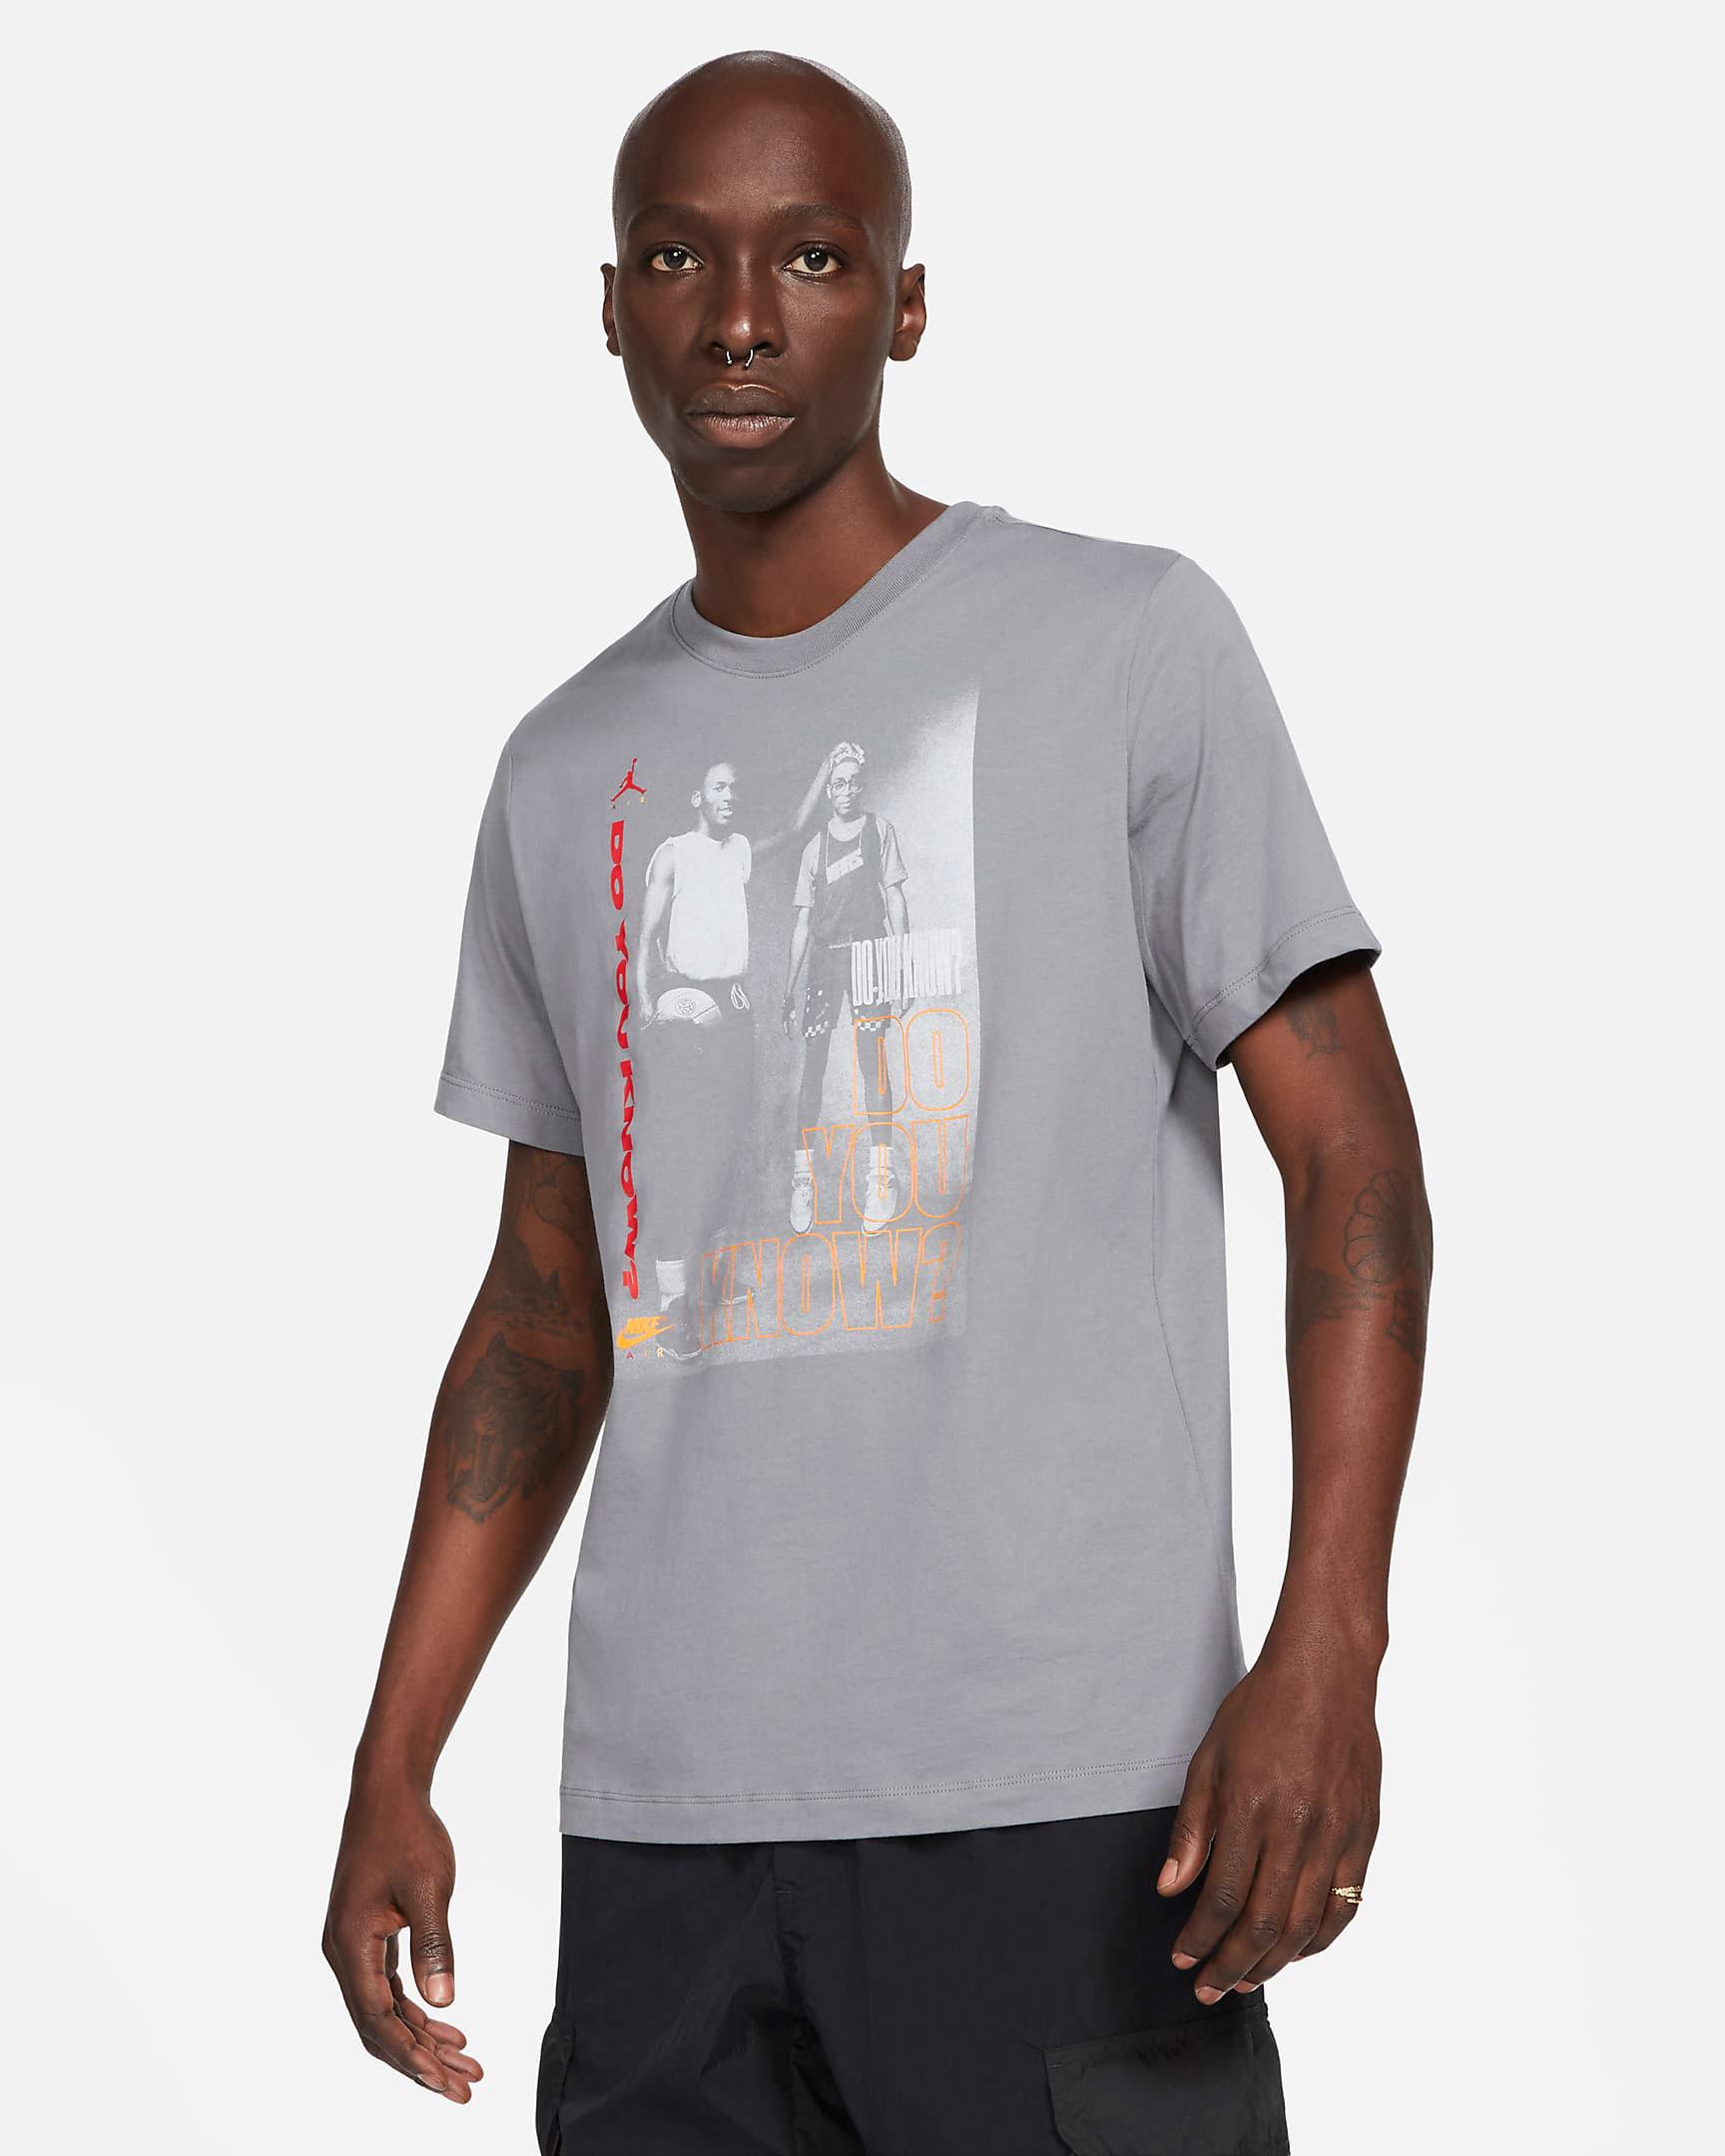 where-to-buy-air-jordan-3-cool-grey-2021-shirt-1